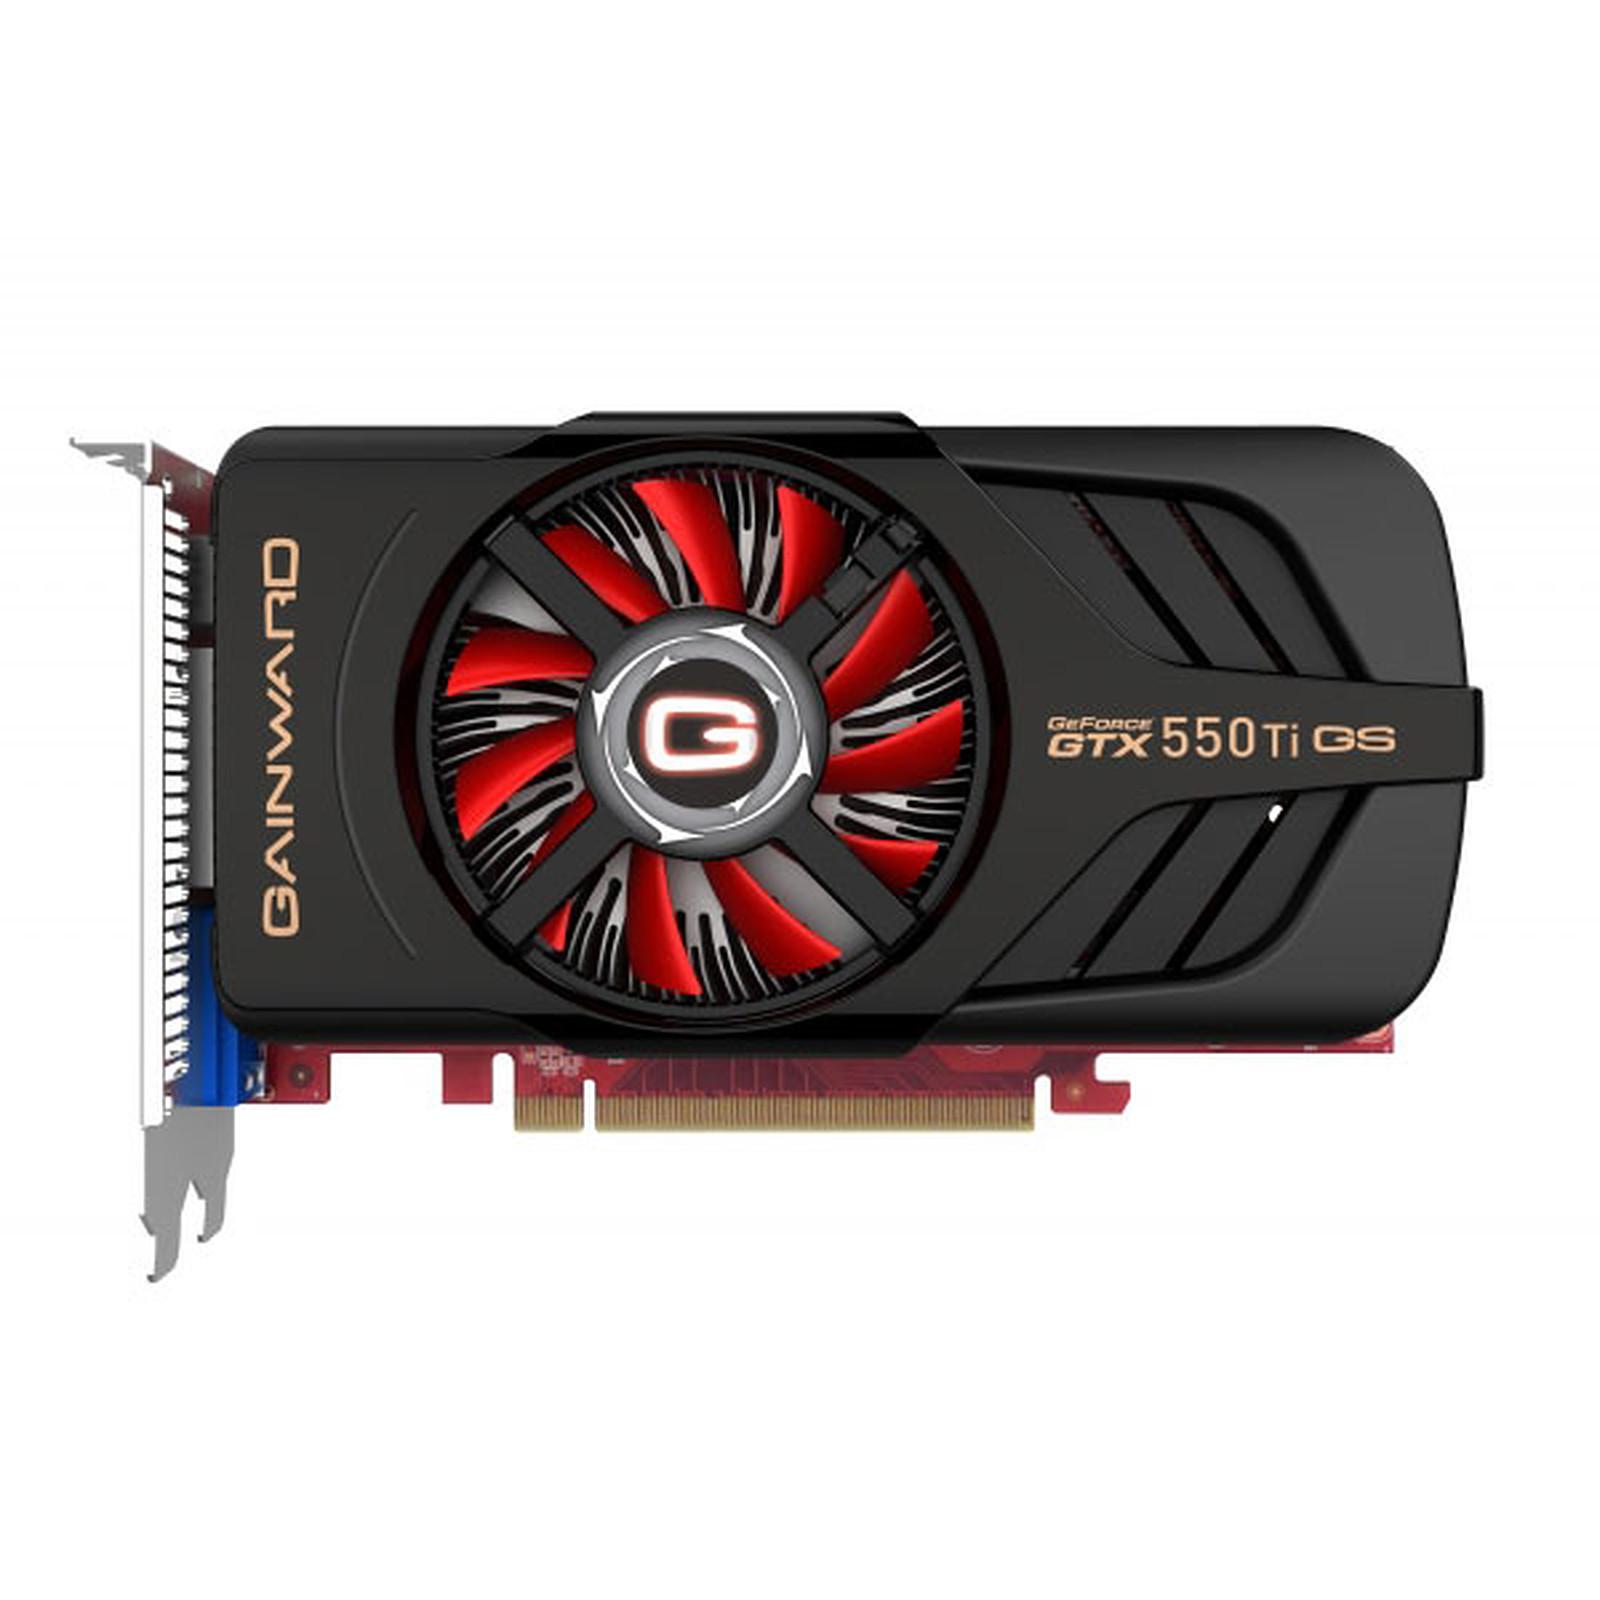 Gainward GeForce GTX 550 Ti 1024MB Golden Sample